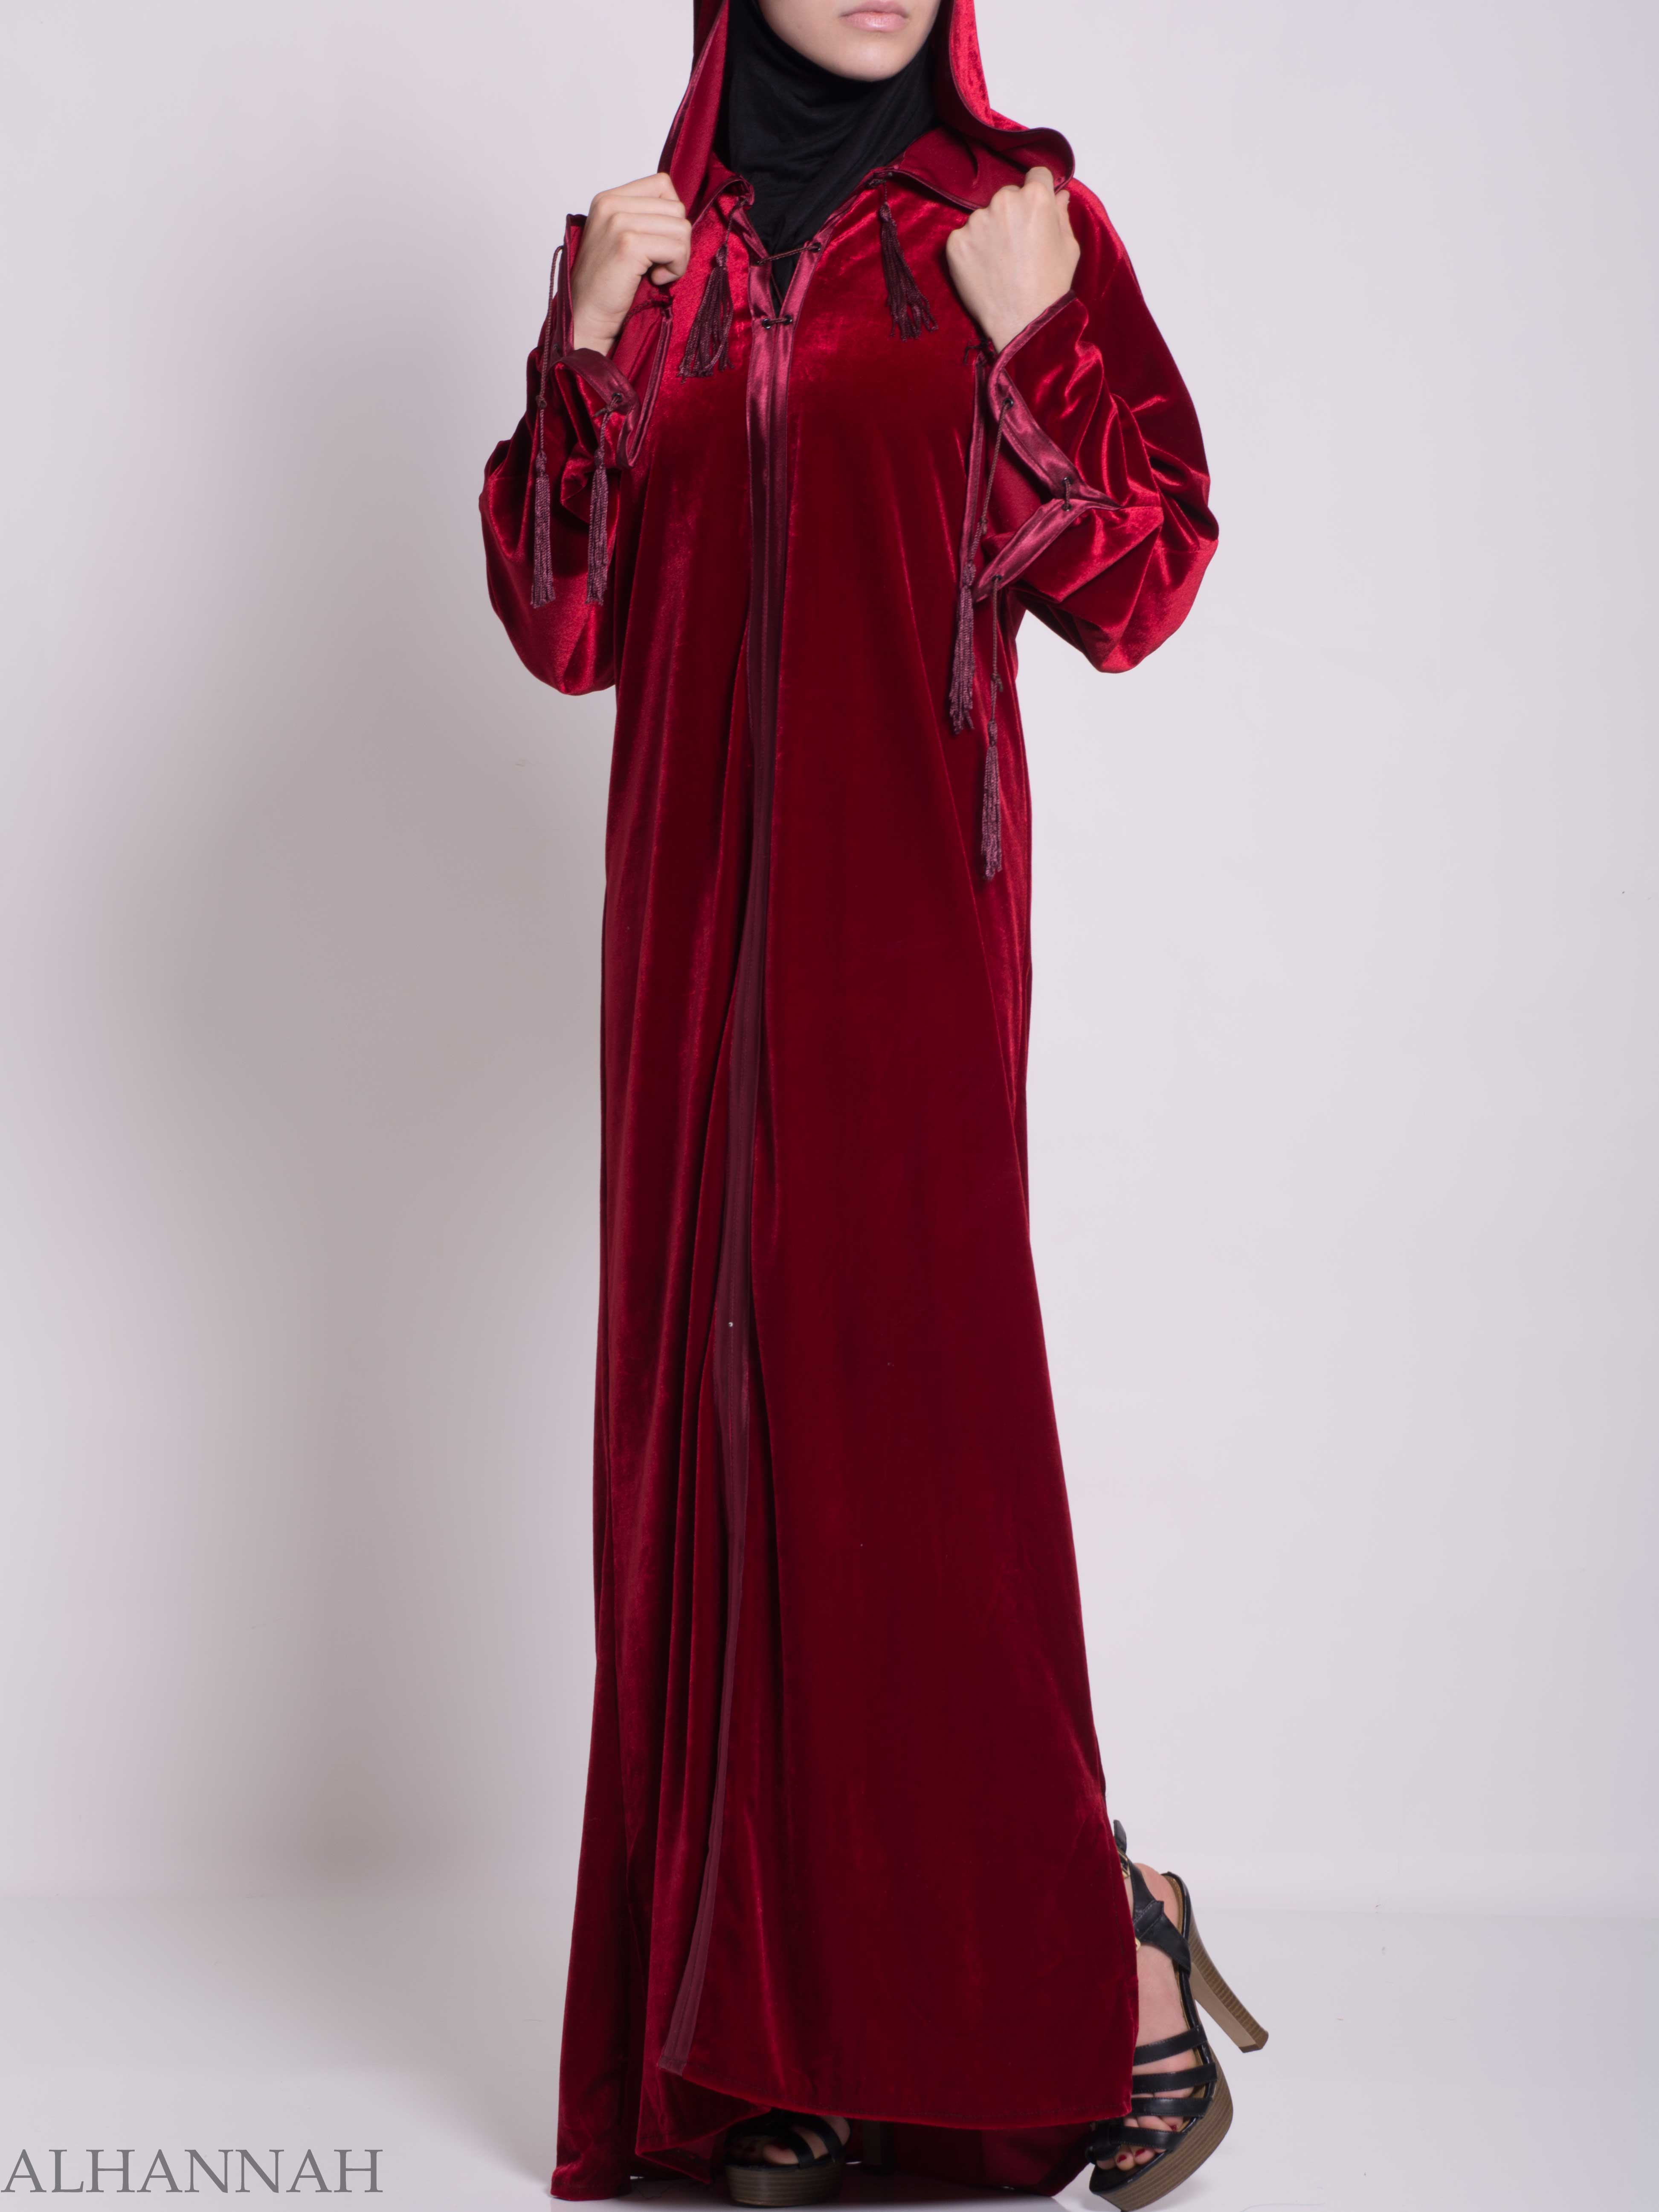 Hooded Laced Syrian Velvet Thobe TH791 (4)